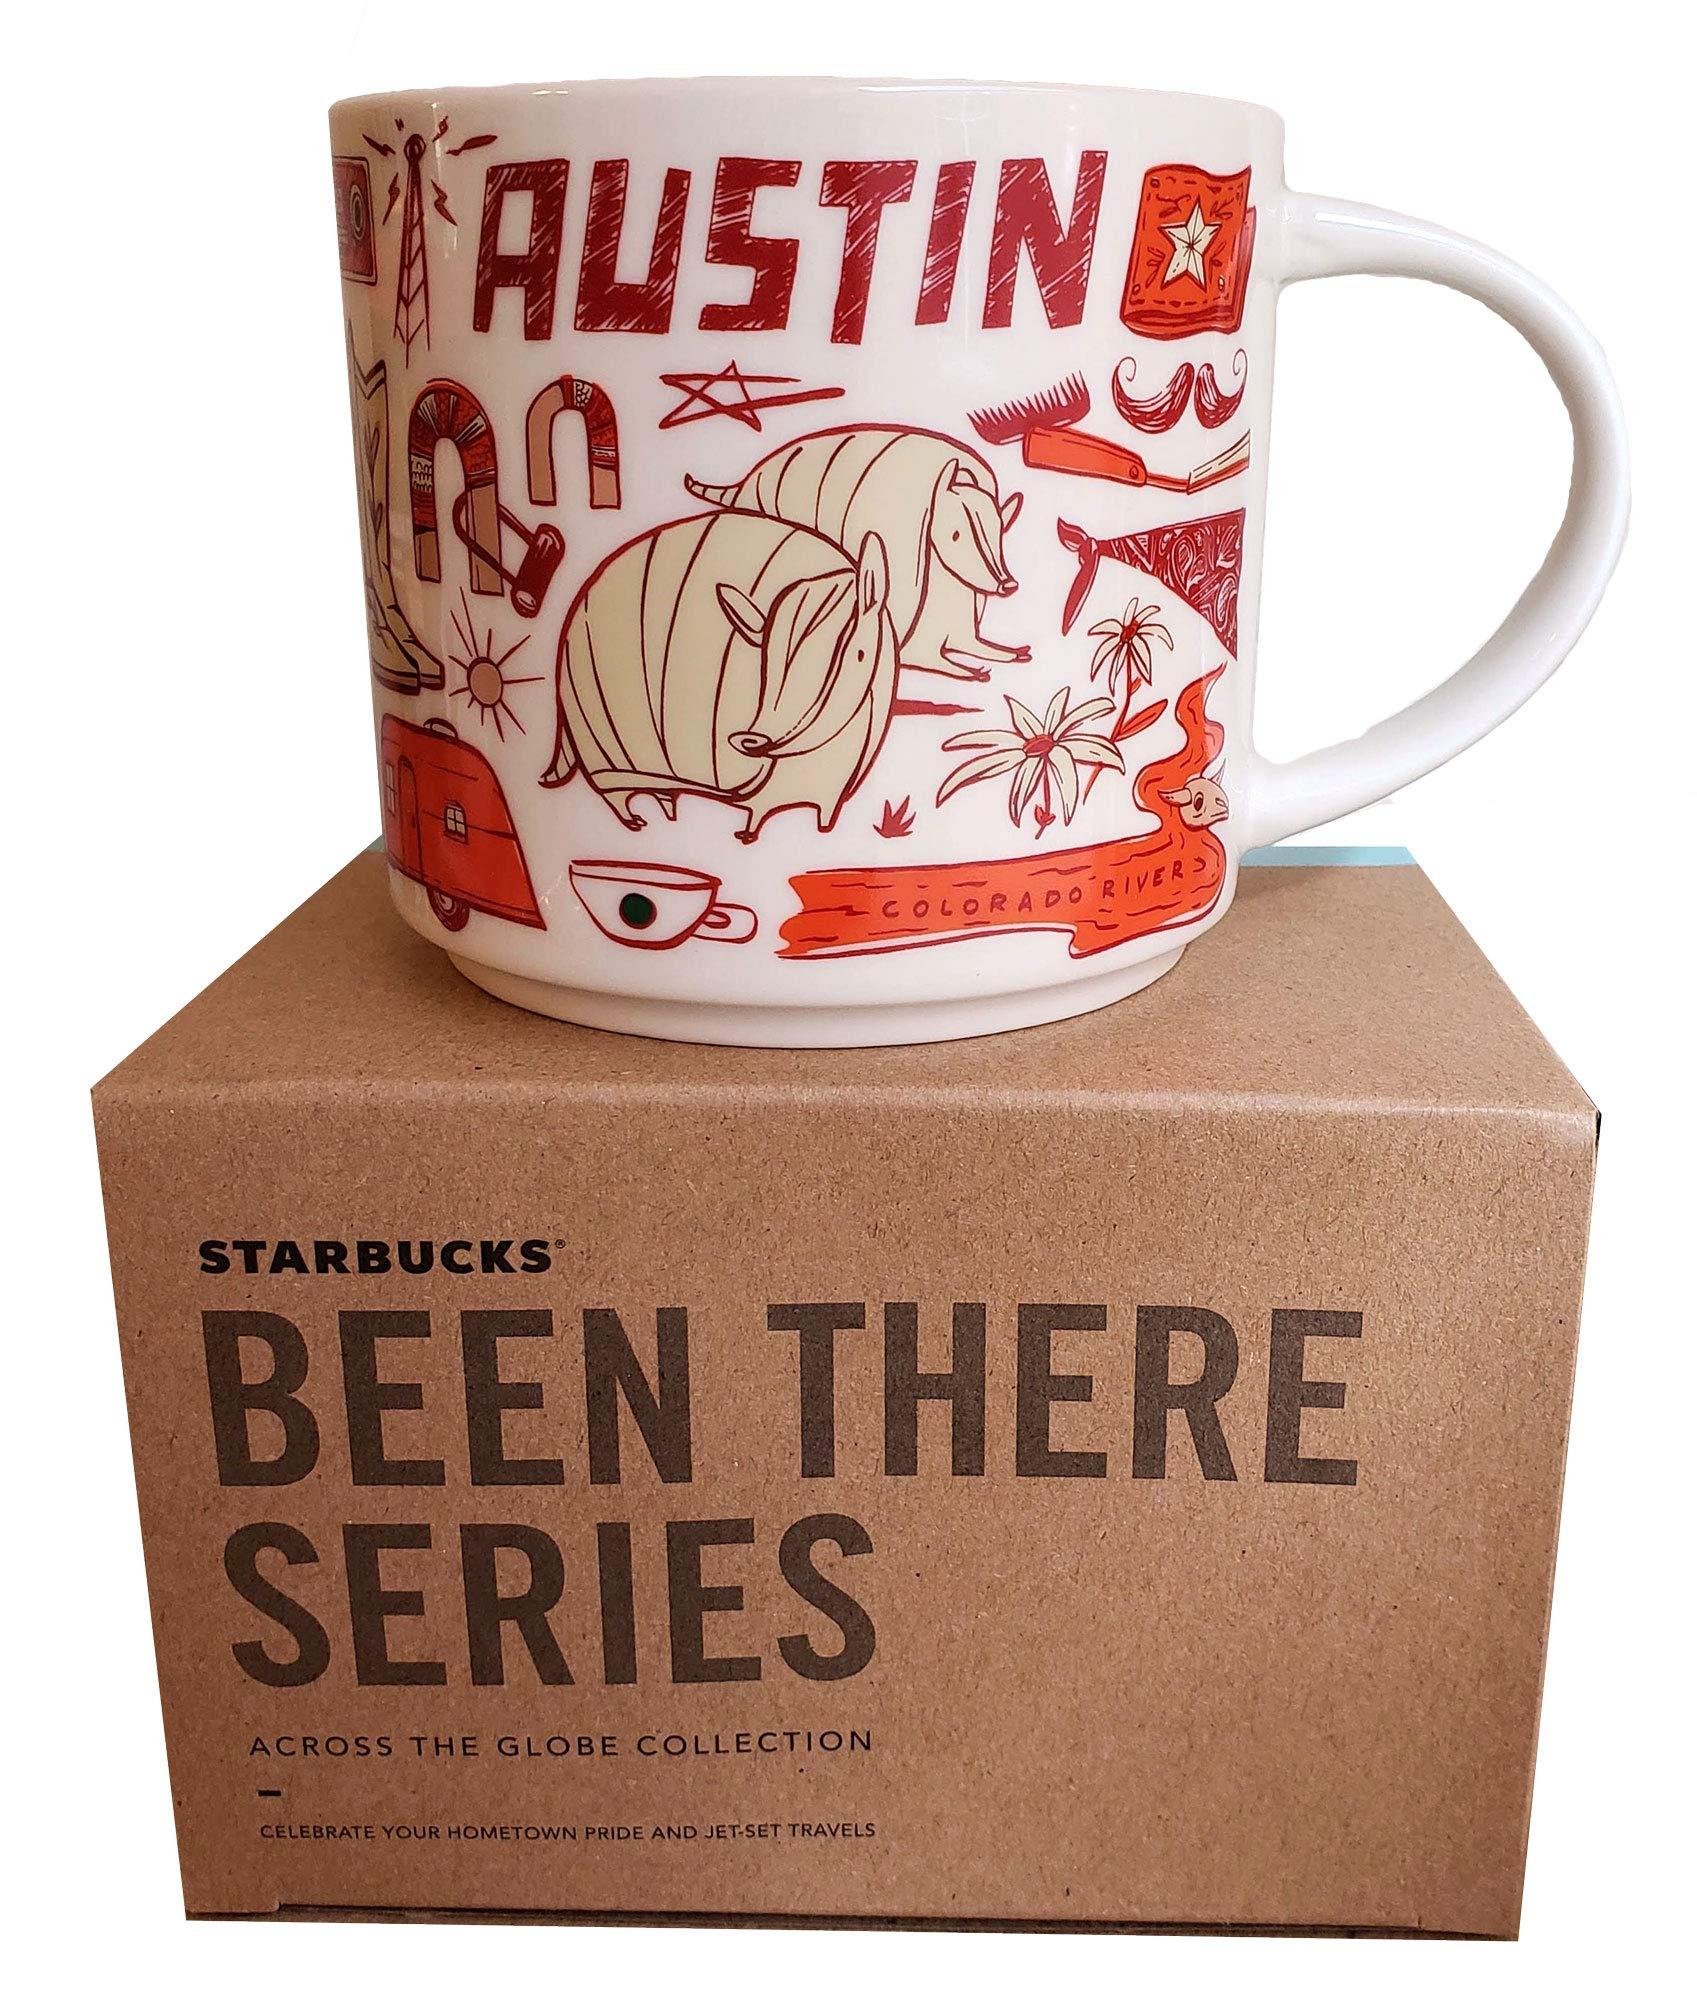 Starbucks Austin Coffee Mug - Been There Series by Starbucks (Image #5)